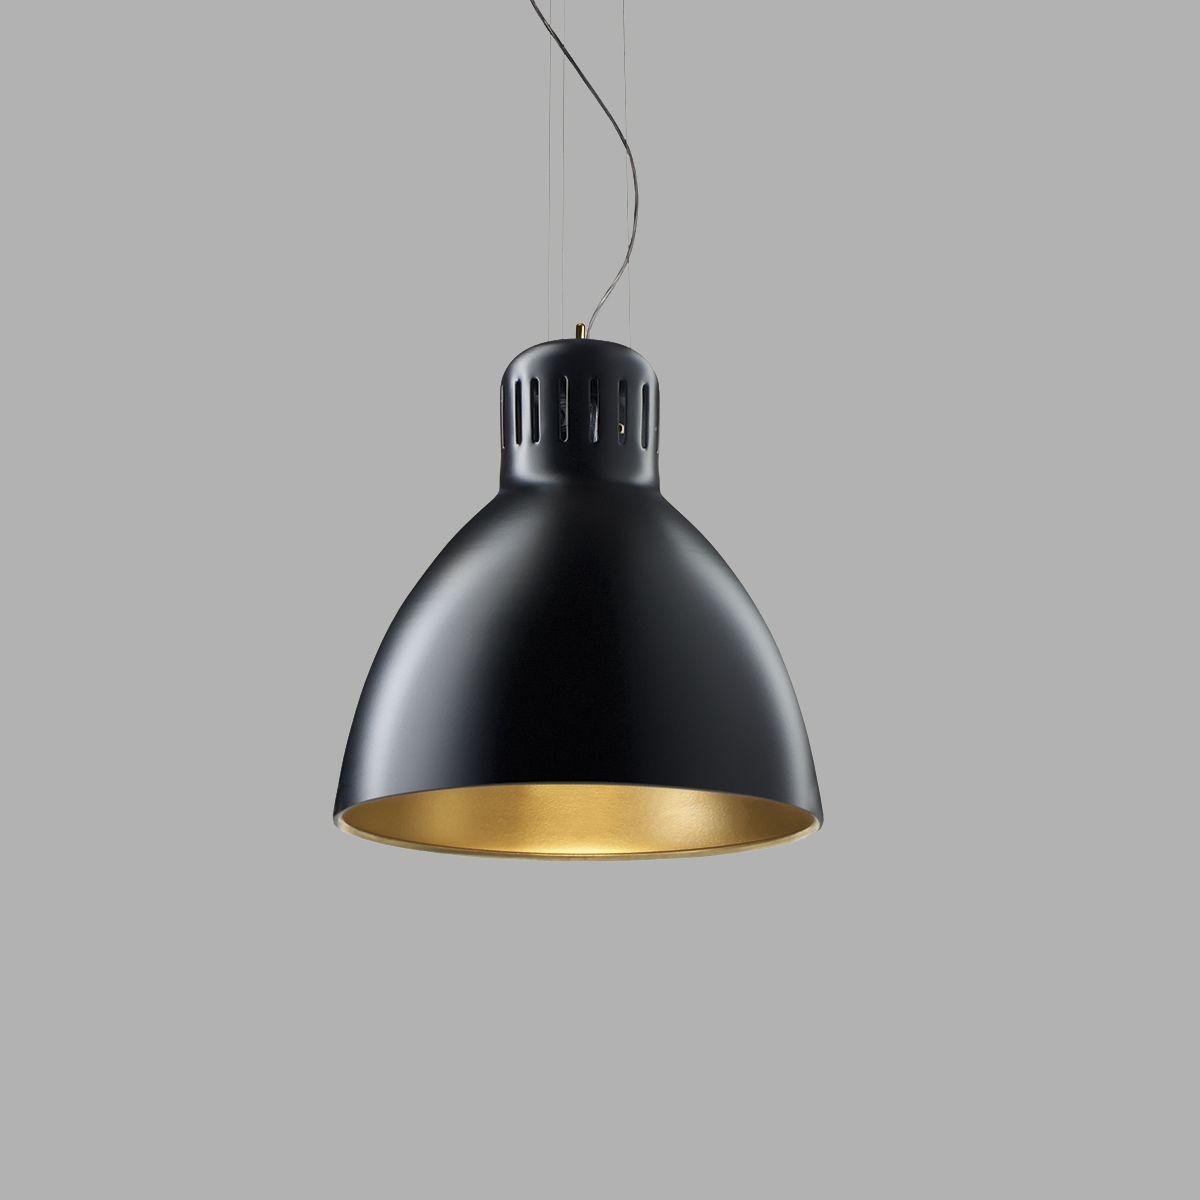 Lampe suspension / design industriel / en aluminium / noire - ARCHI ...